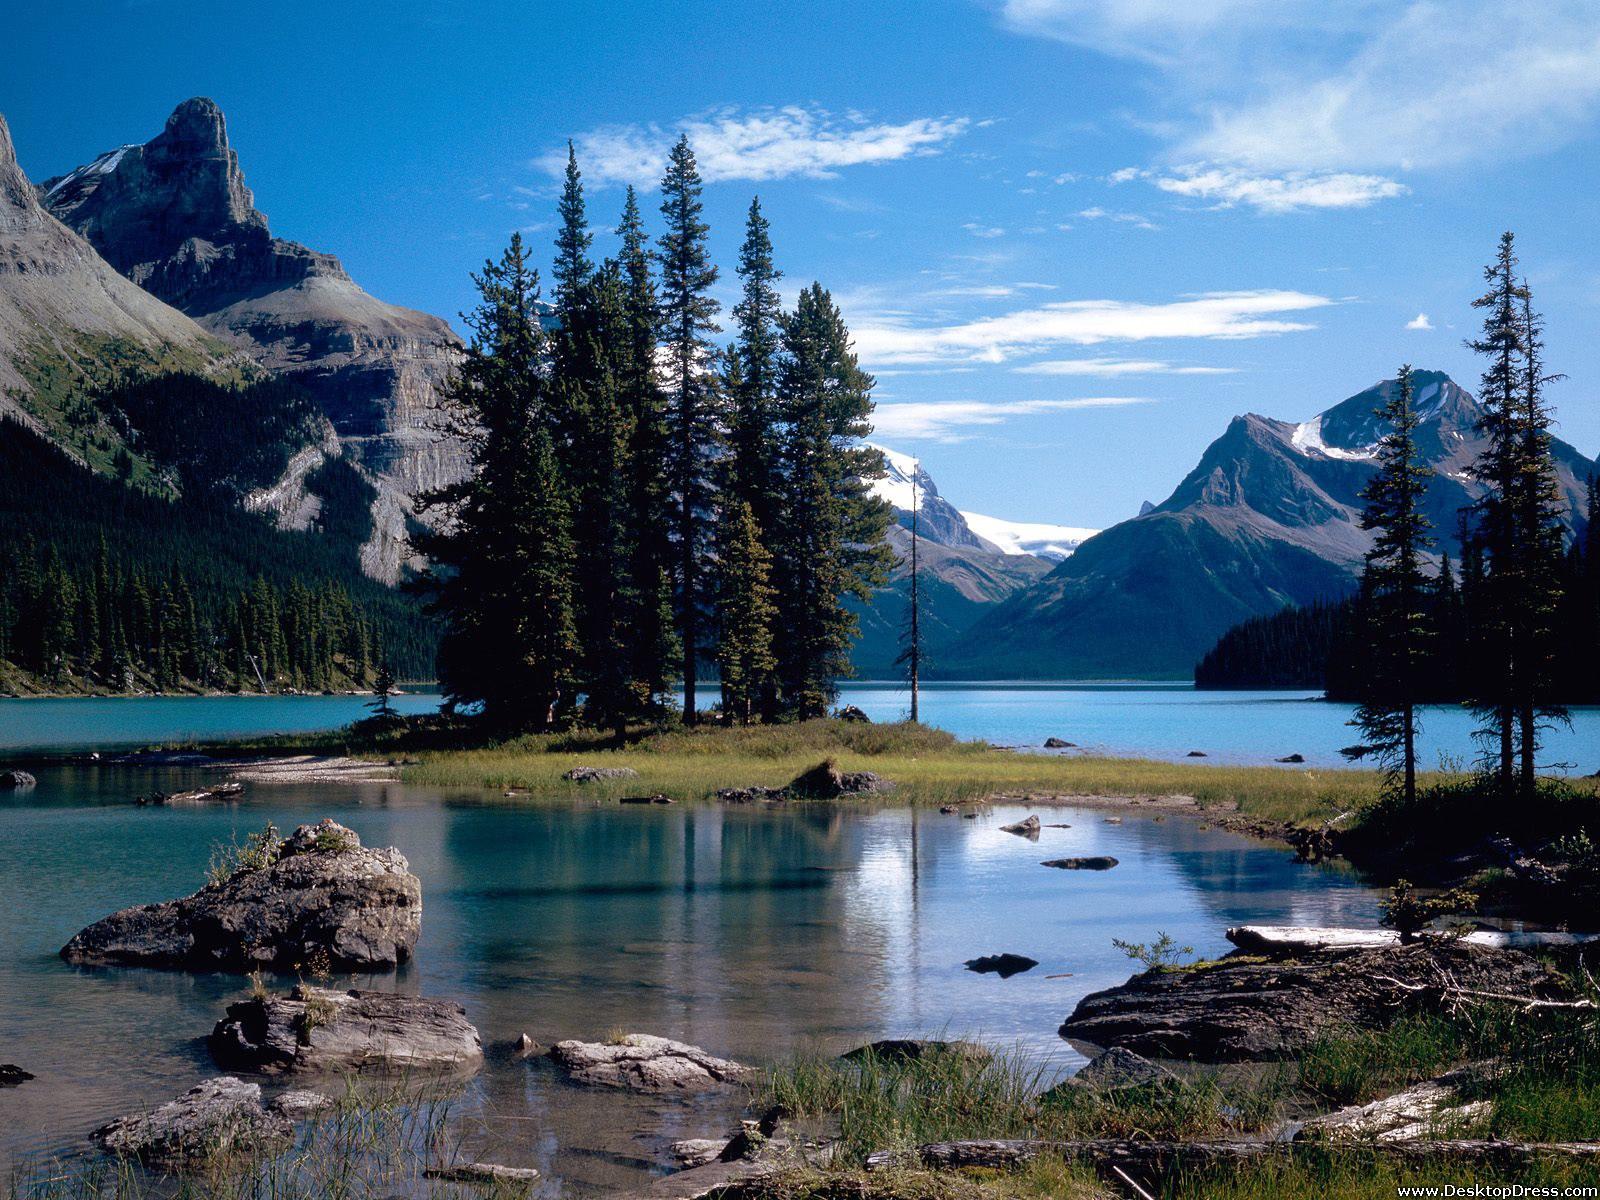 Desktop Wallpapers Natural Backgrounds Jasper National Park 1600x1200